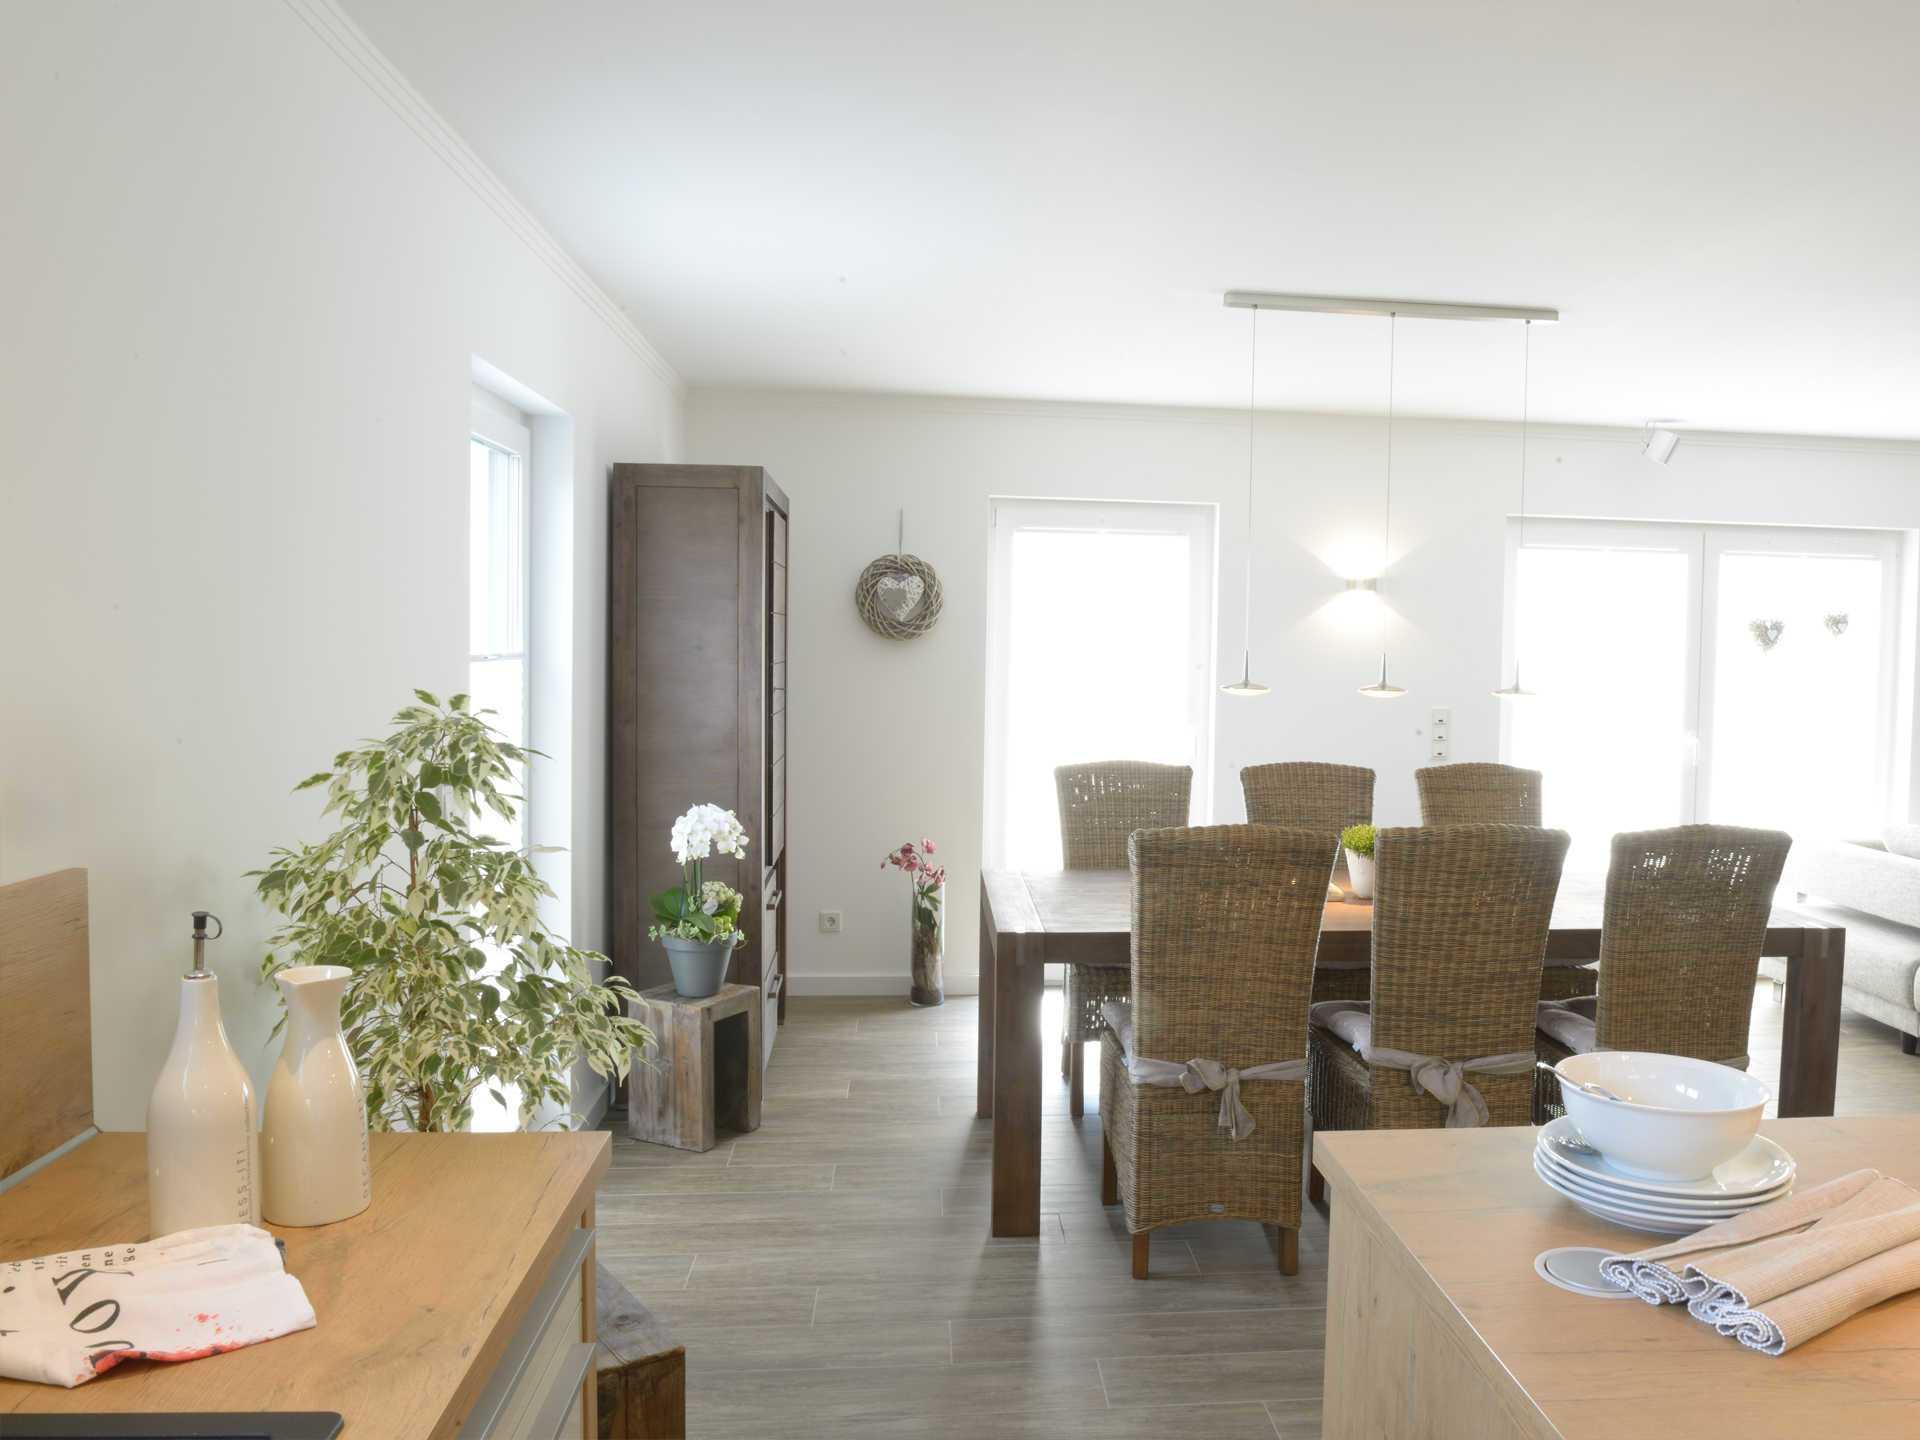 stadtvilla medio fingerhut haus. Black Bedroom Furniture Sets. Home Design Ideas